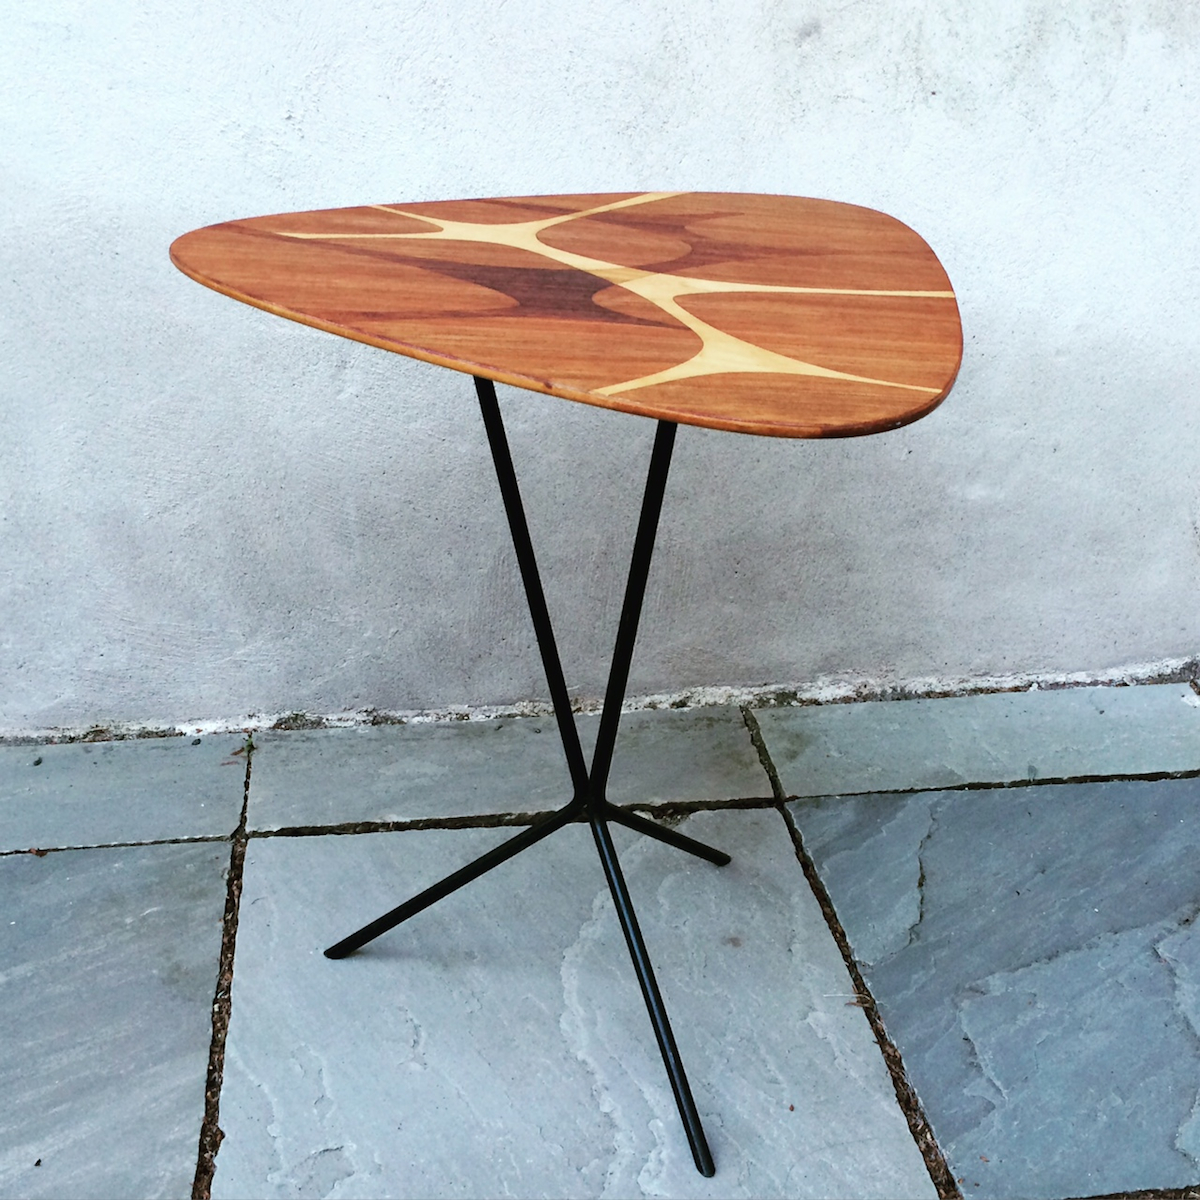 FABRIKEN_Trebent-bord